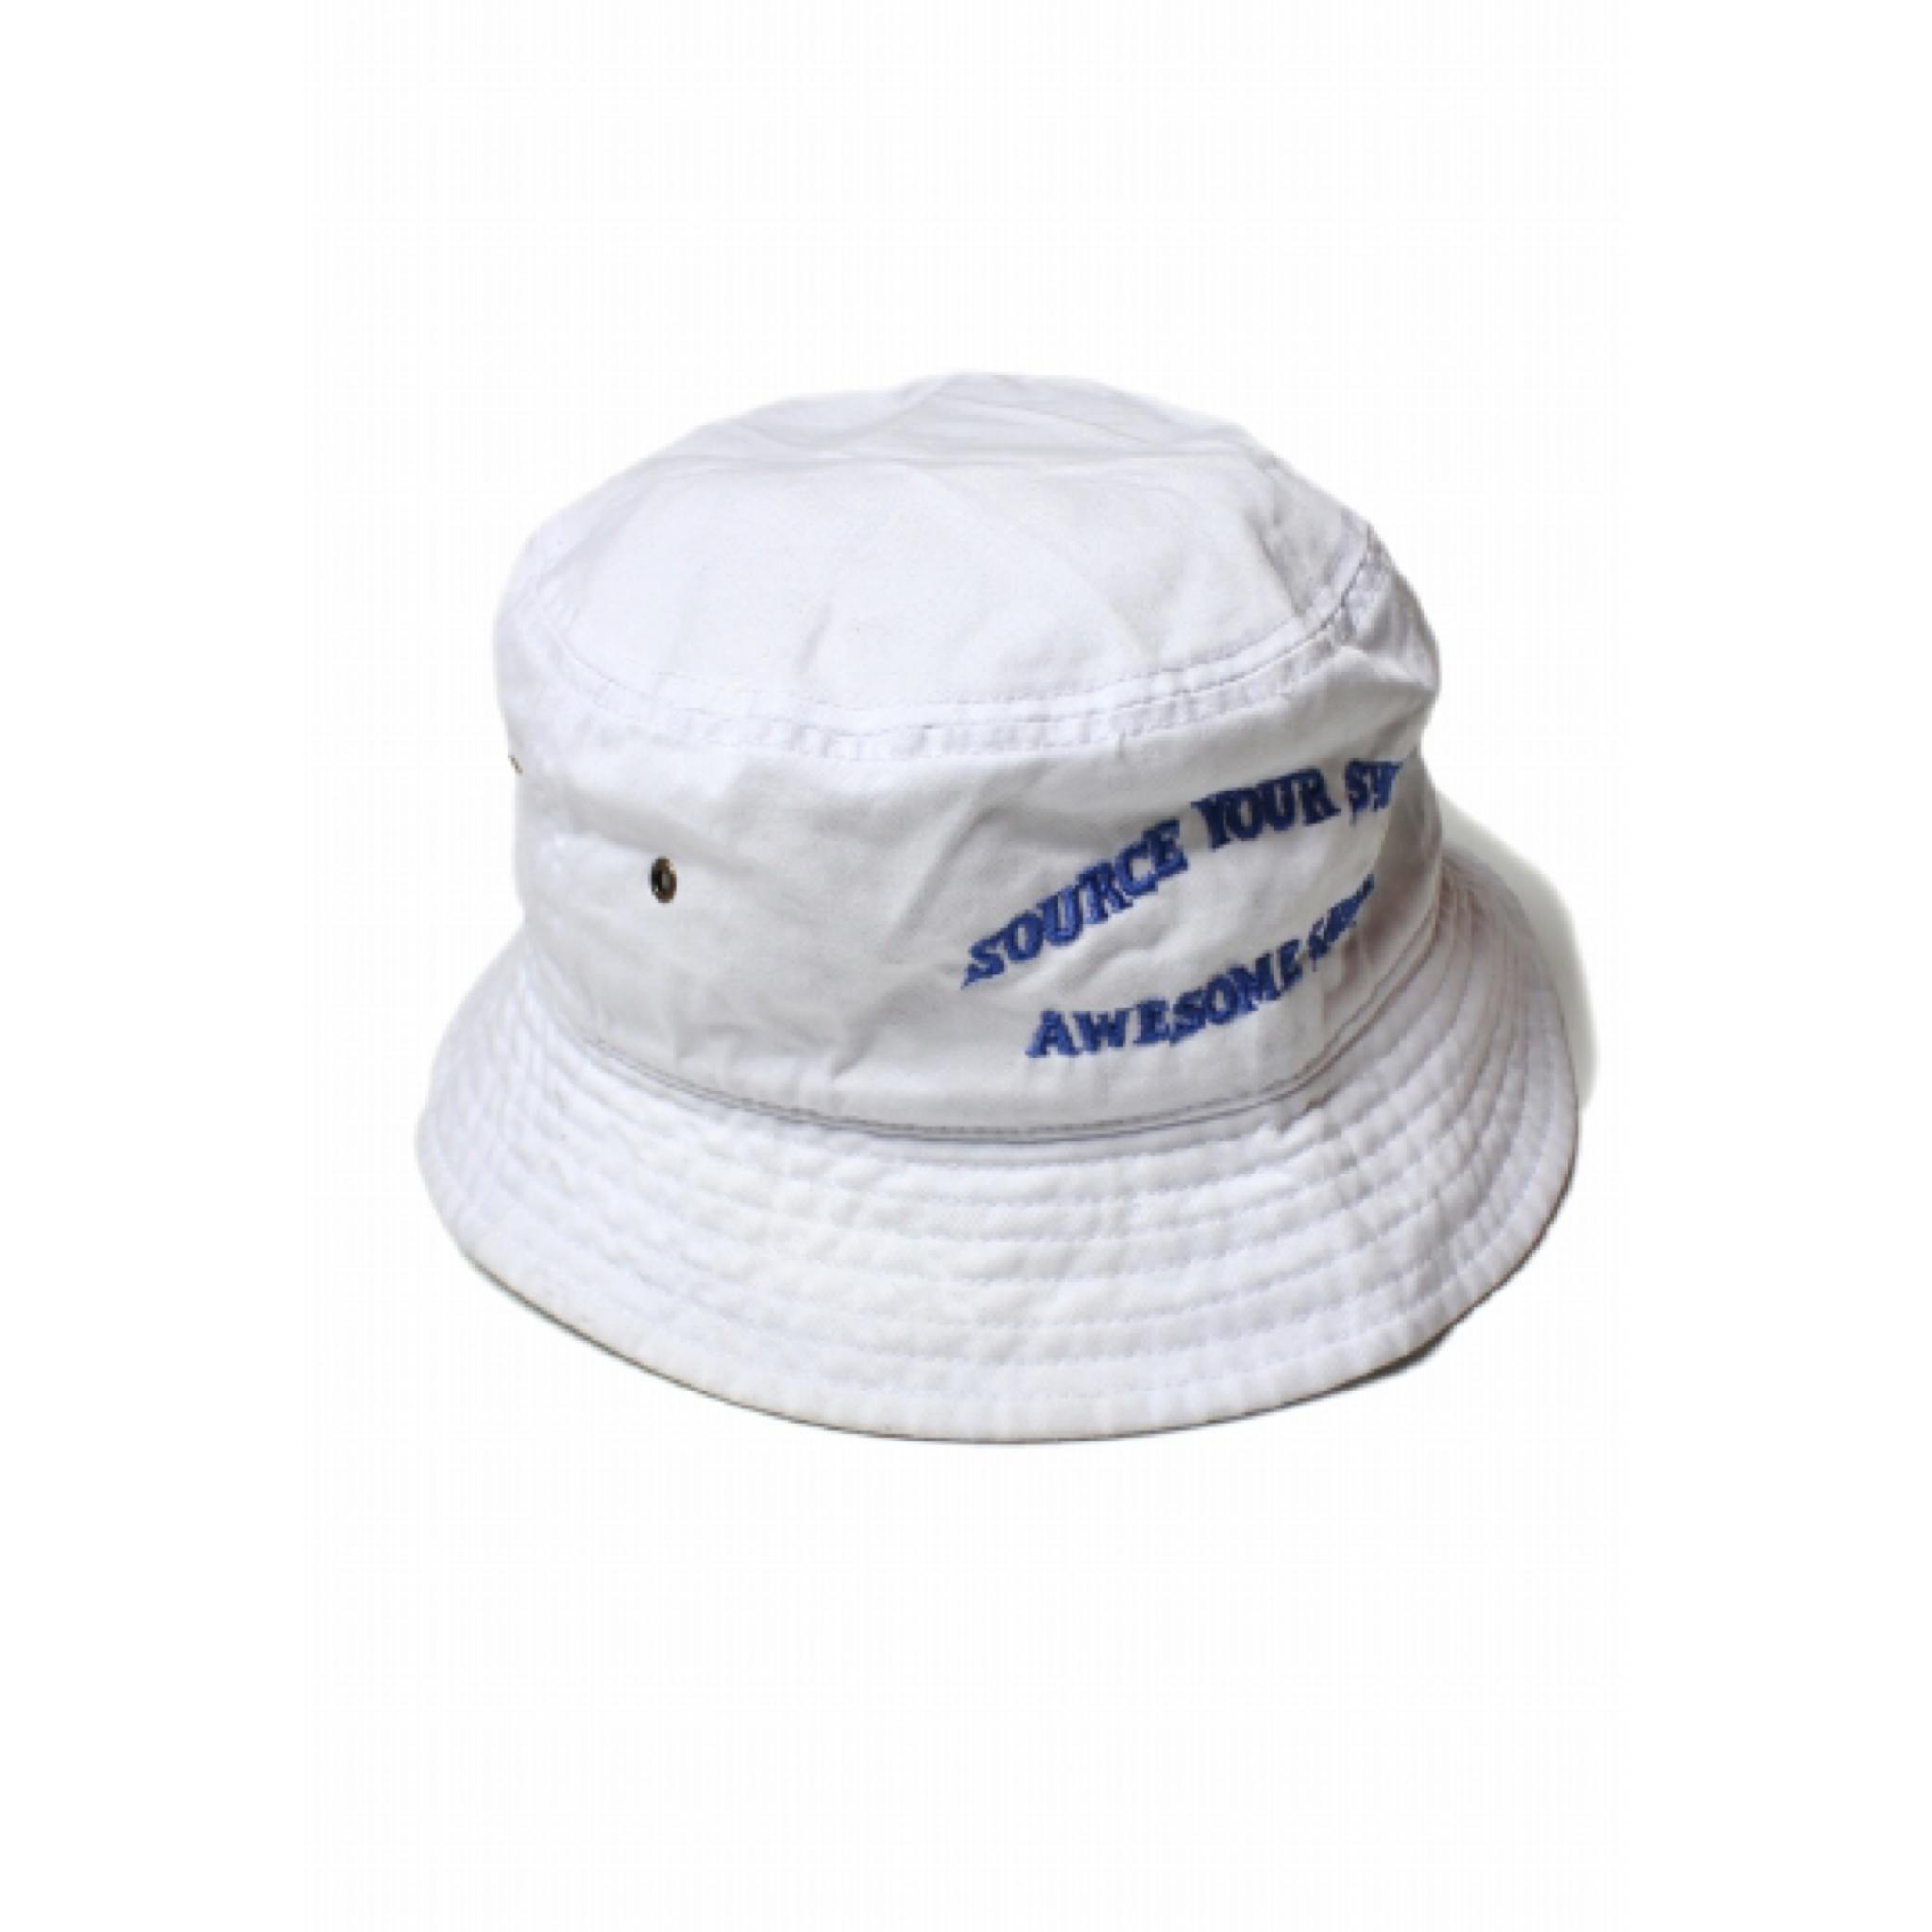 RUTHLESS #R-Sauce Bucket Hat